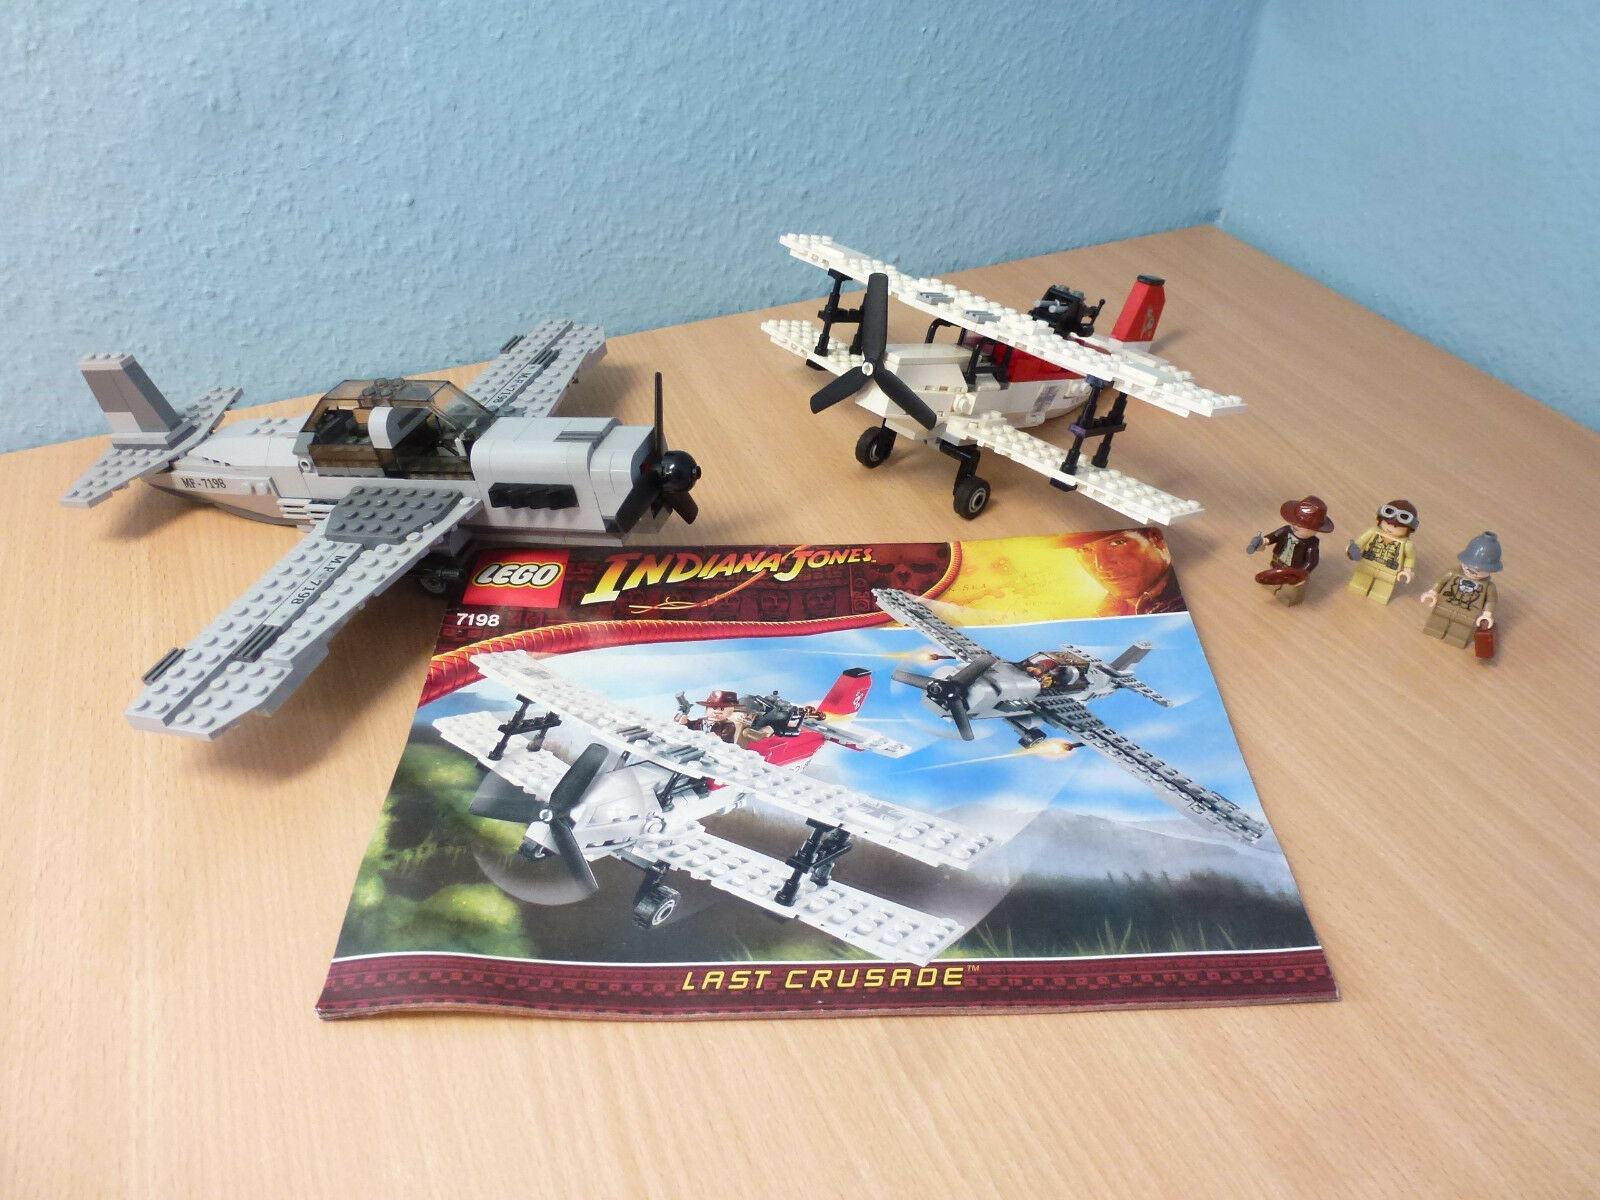 Lego 7198  Indiana Jones Set - Flucht im Flugzeug + Bauanleitung 544  se hâta de voir